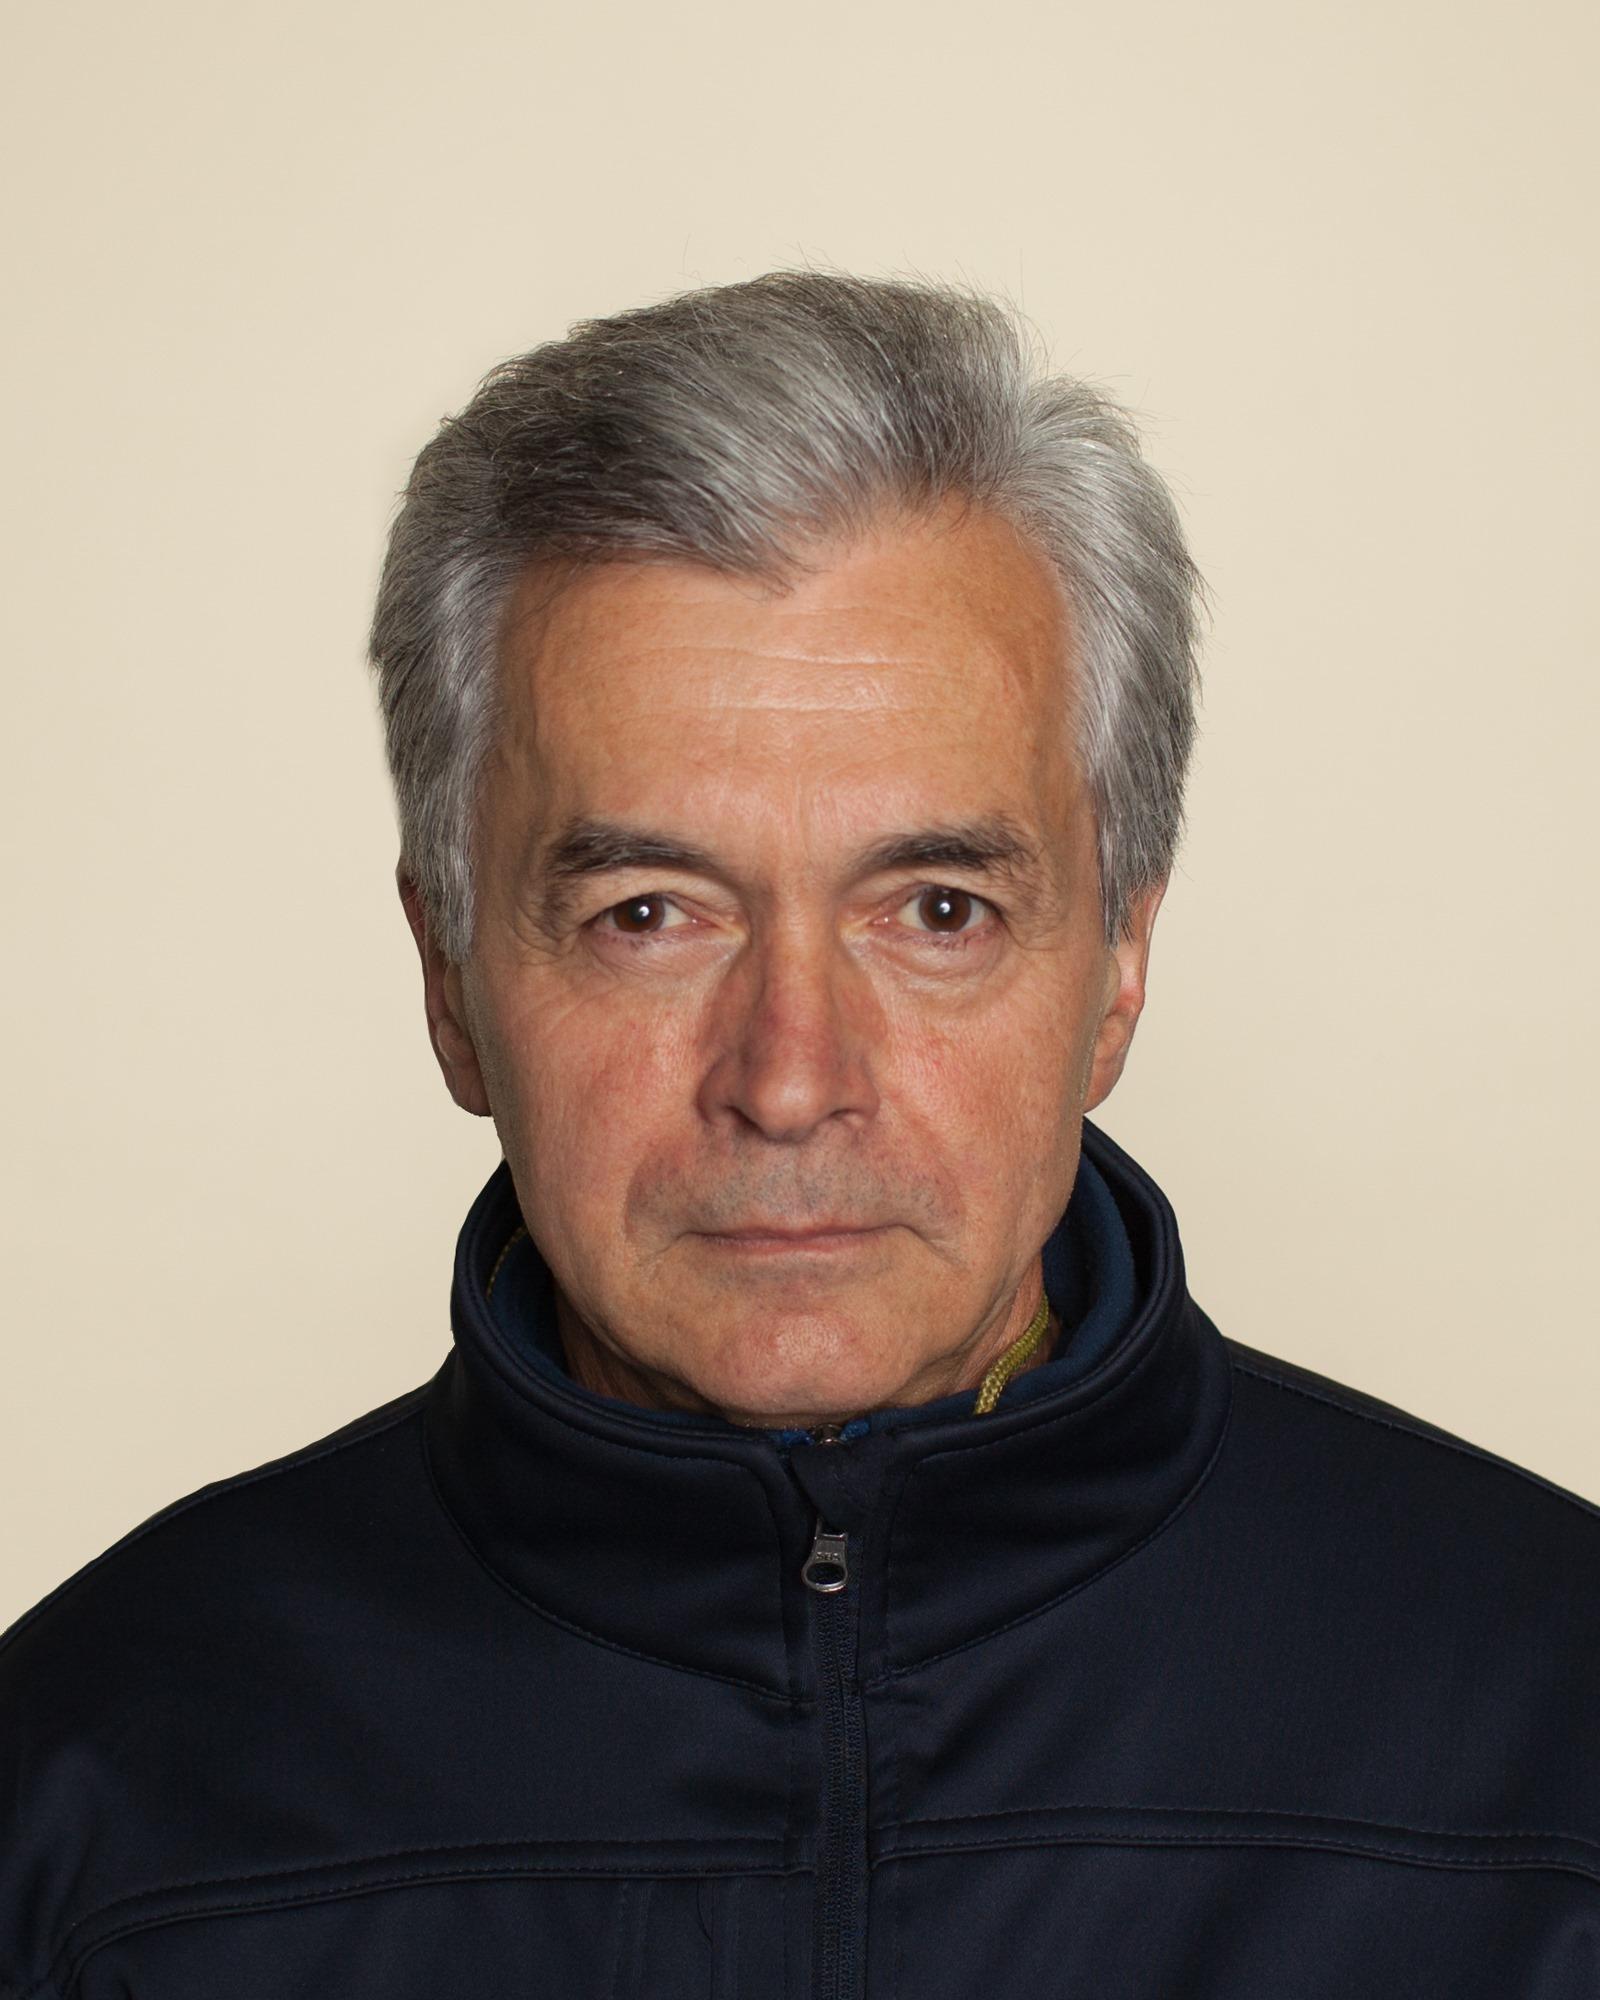 Csaba Kercso-Magos